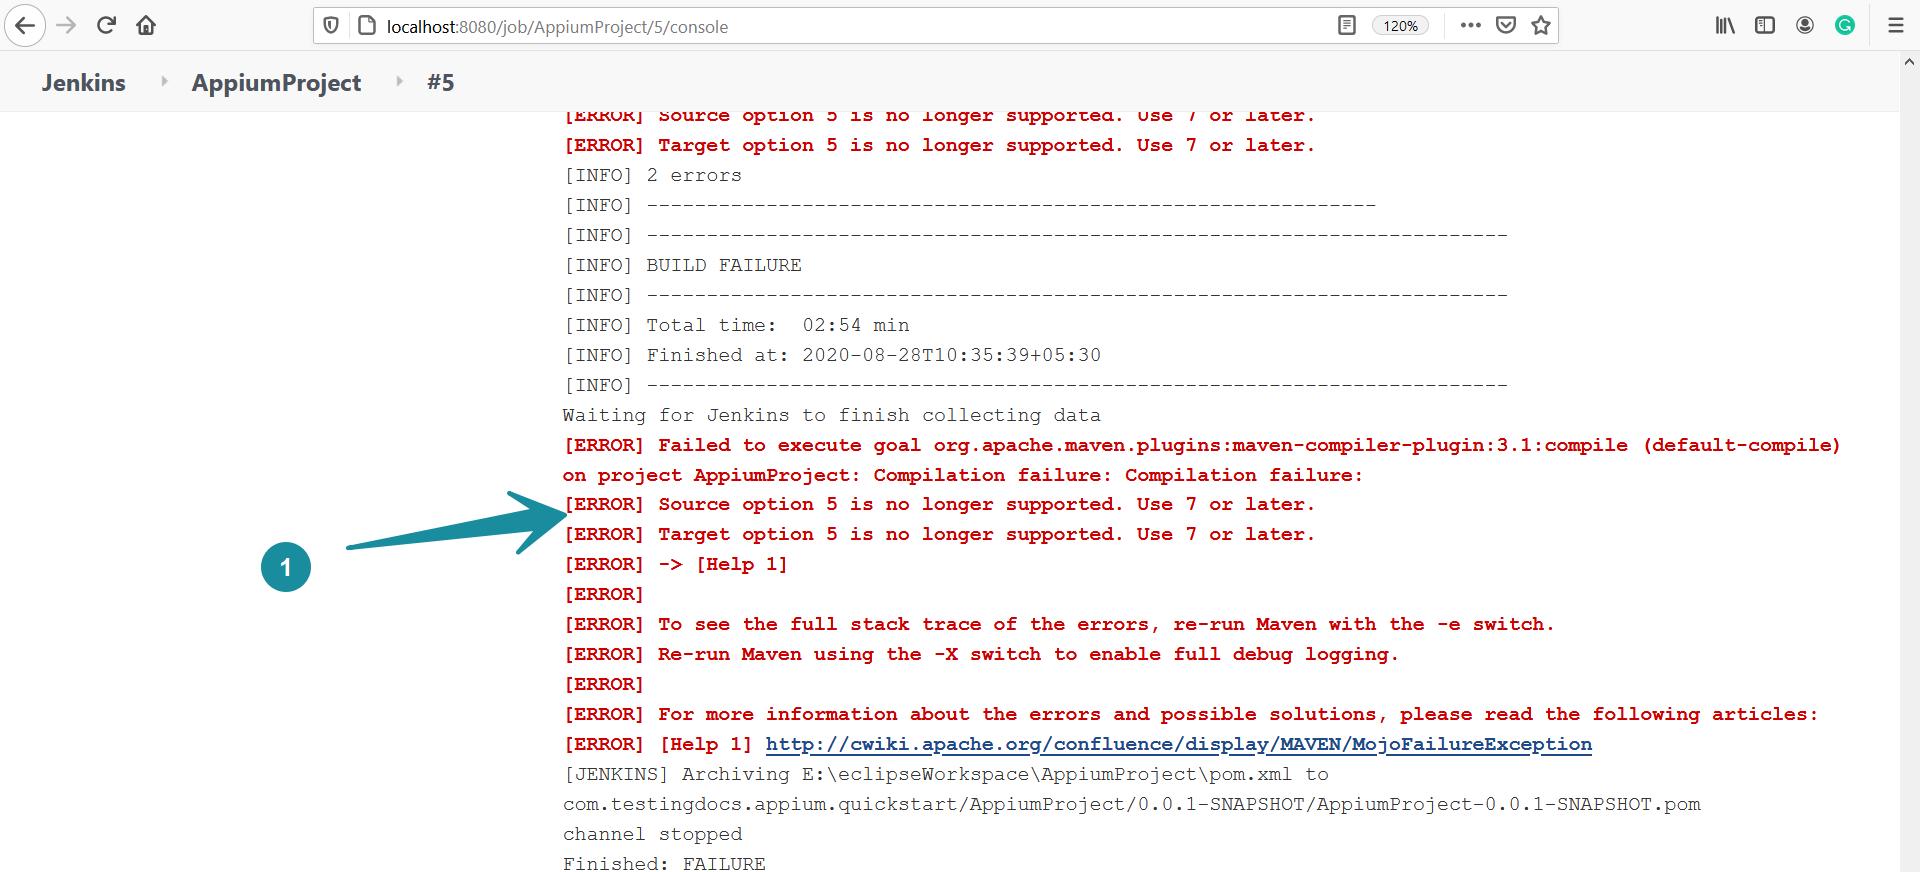 Jenkins Error Source and Target